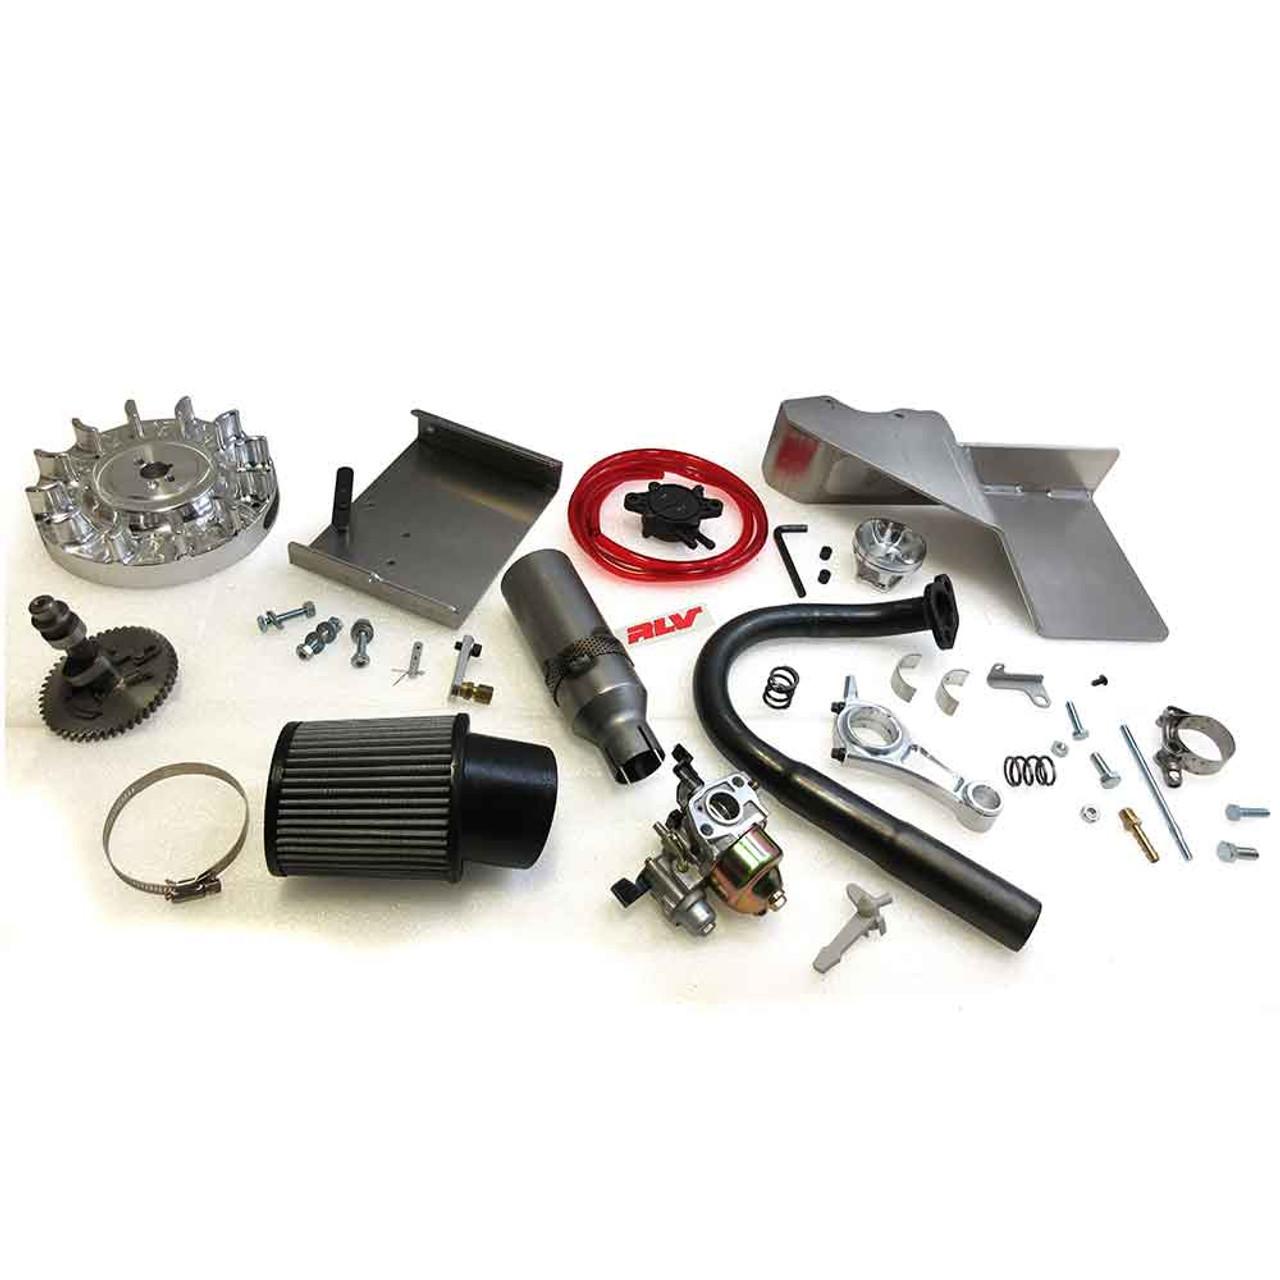 14-15HP+ - Builder Prepared Parts Kit, Predator 212 Non-Hemi Gen 3